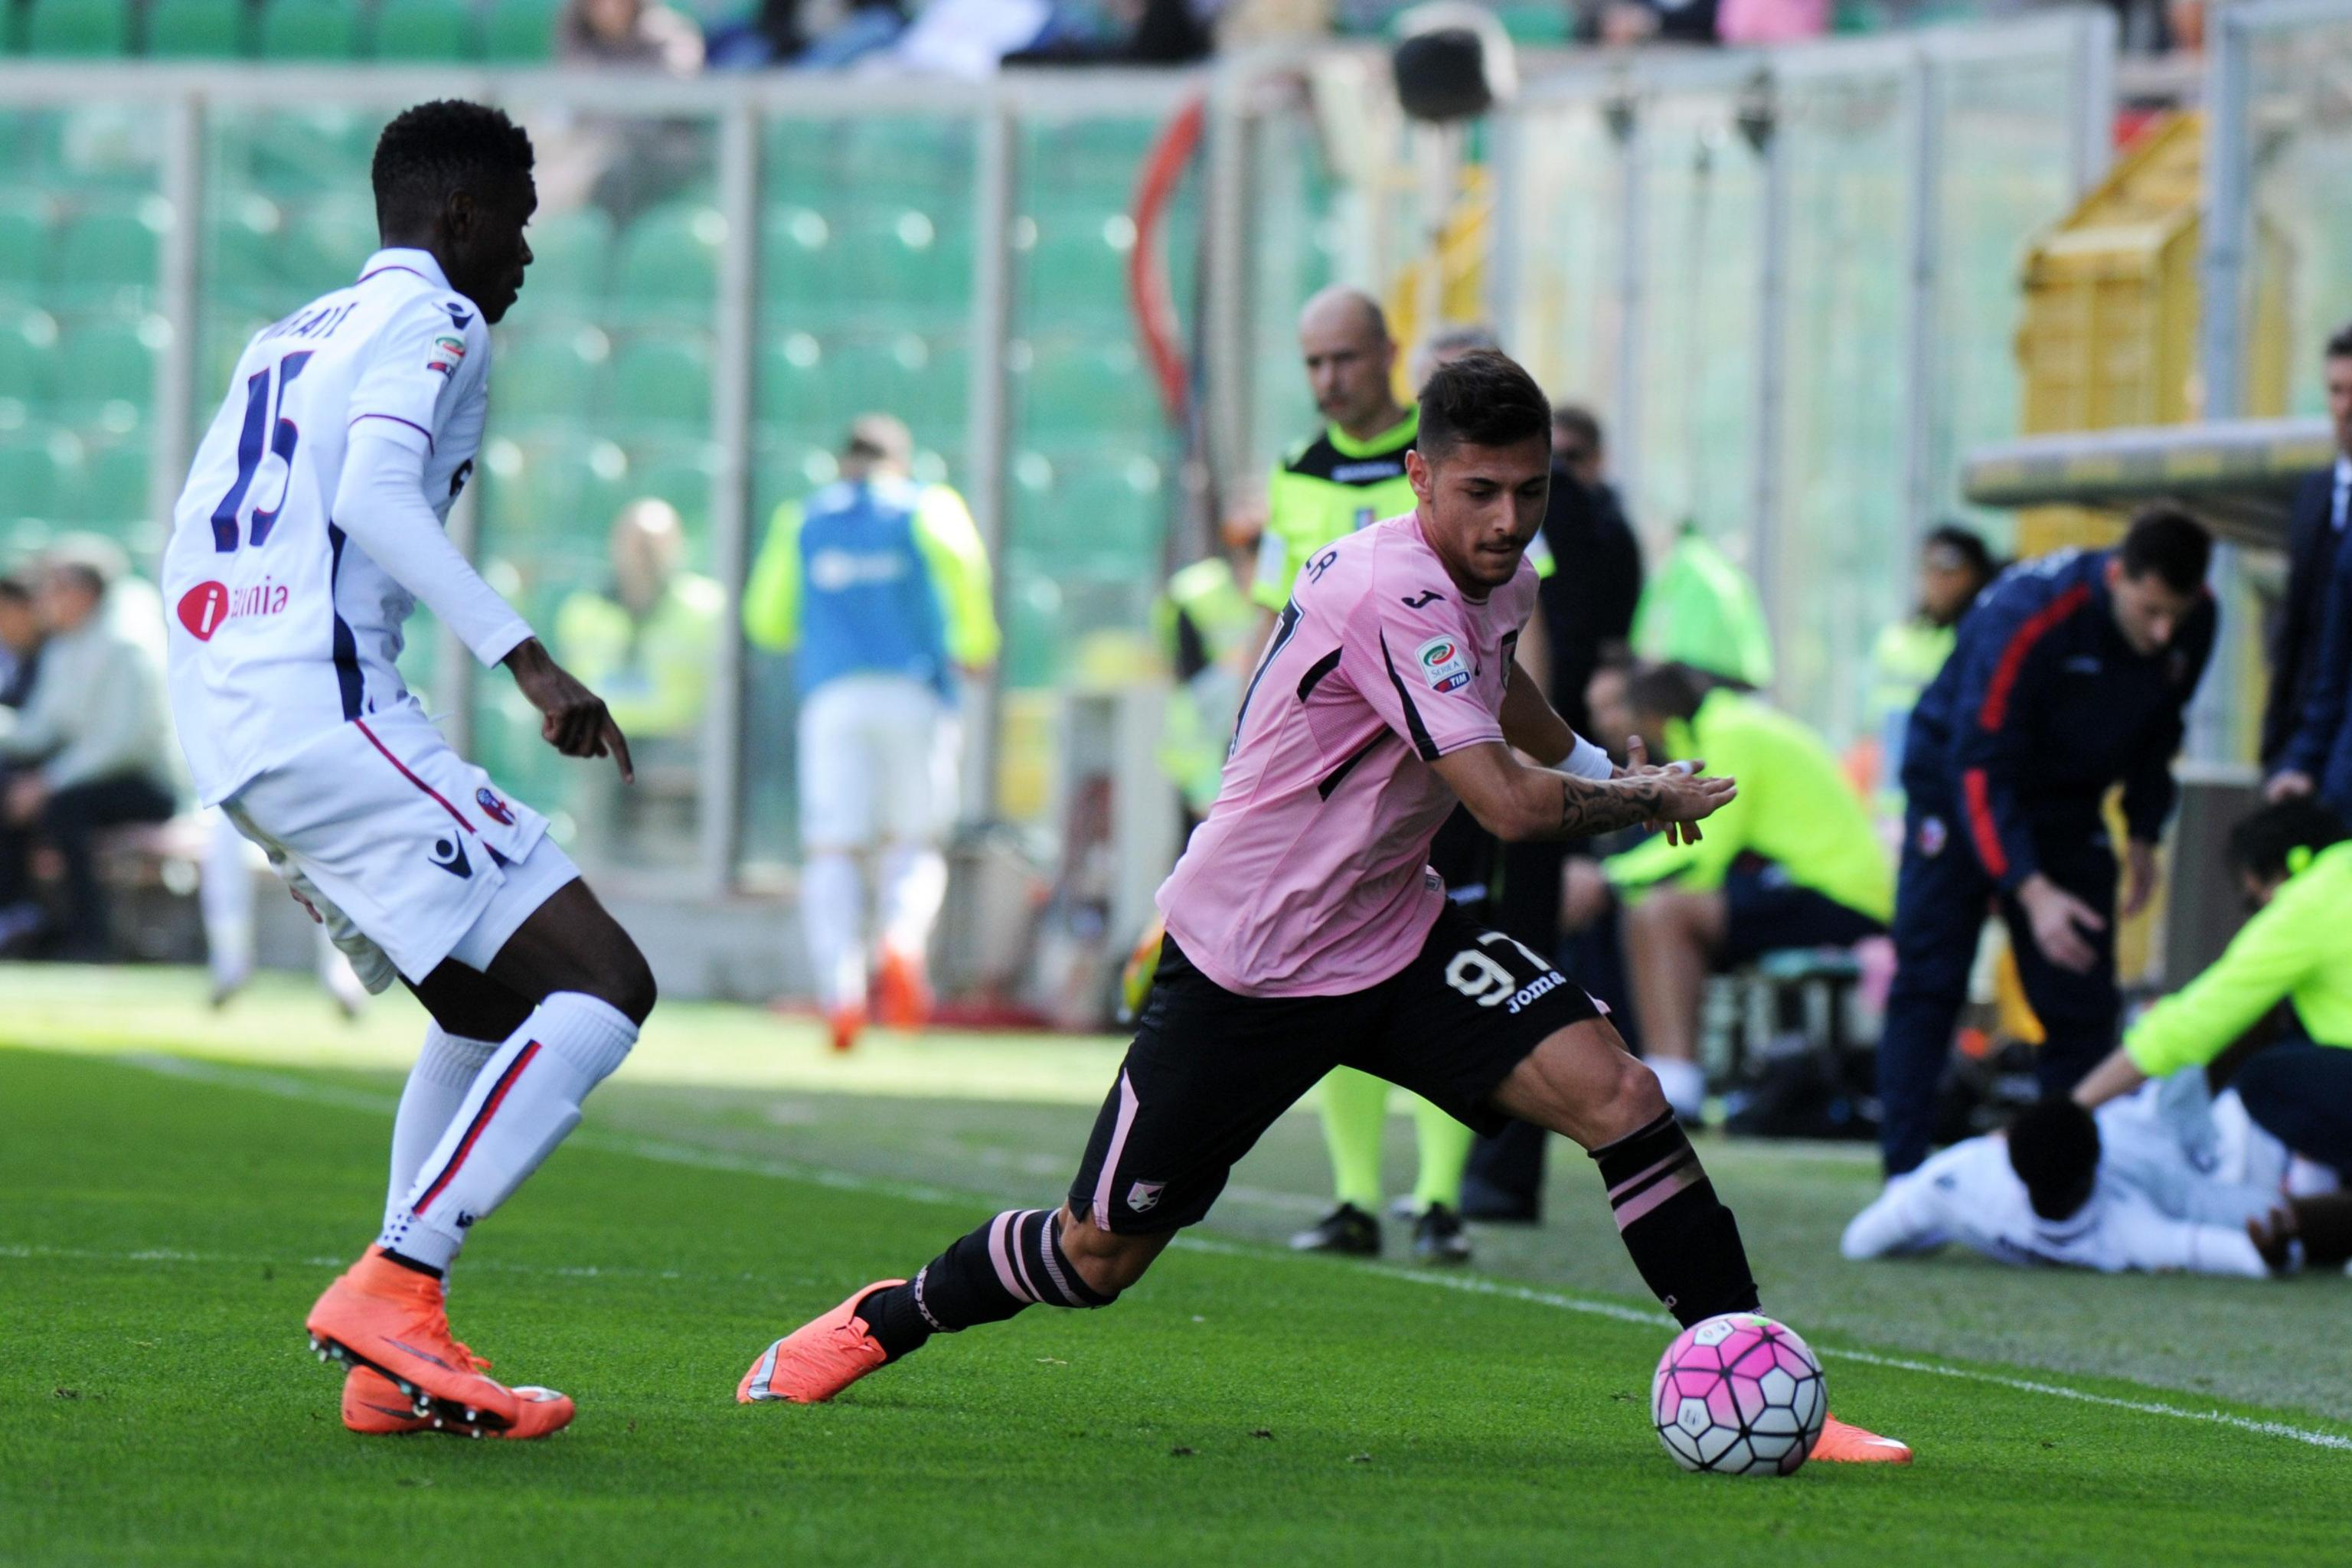 Calcio: serie A, Palermo-Bologna